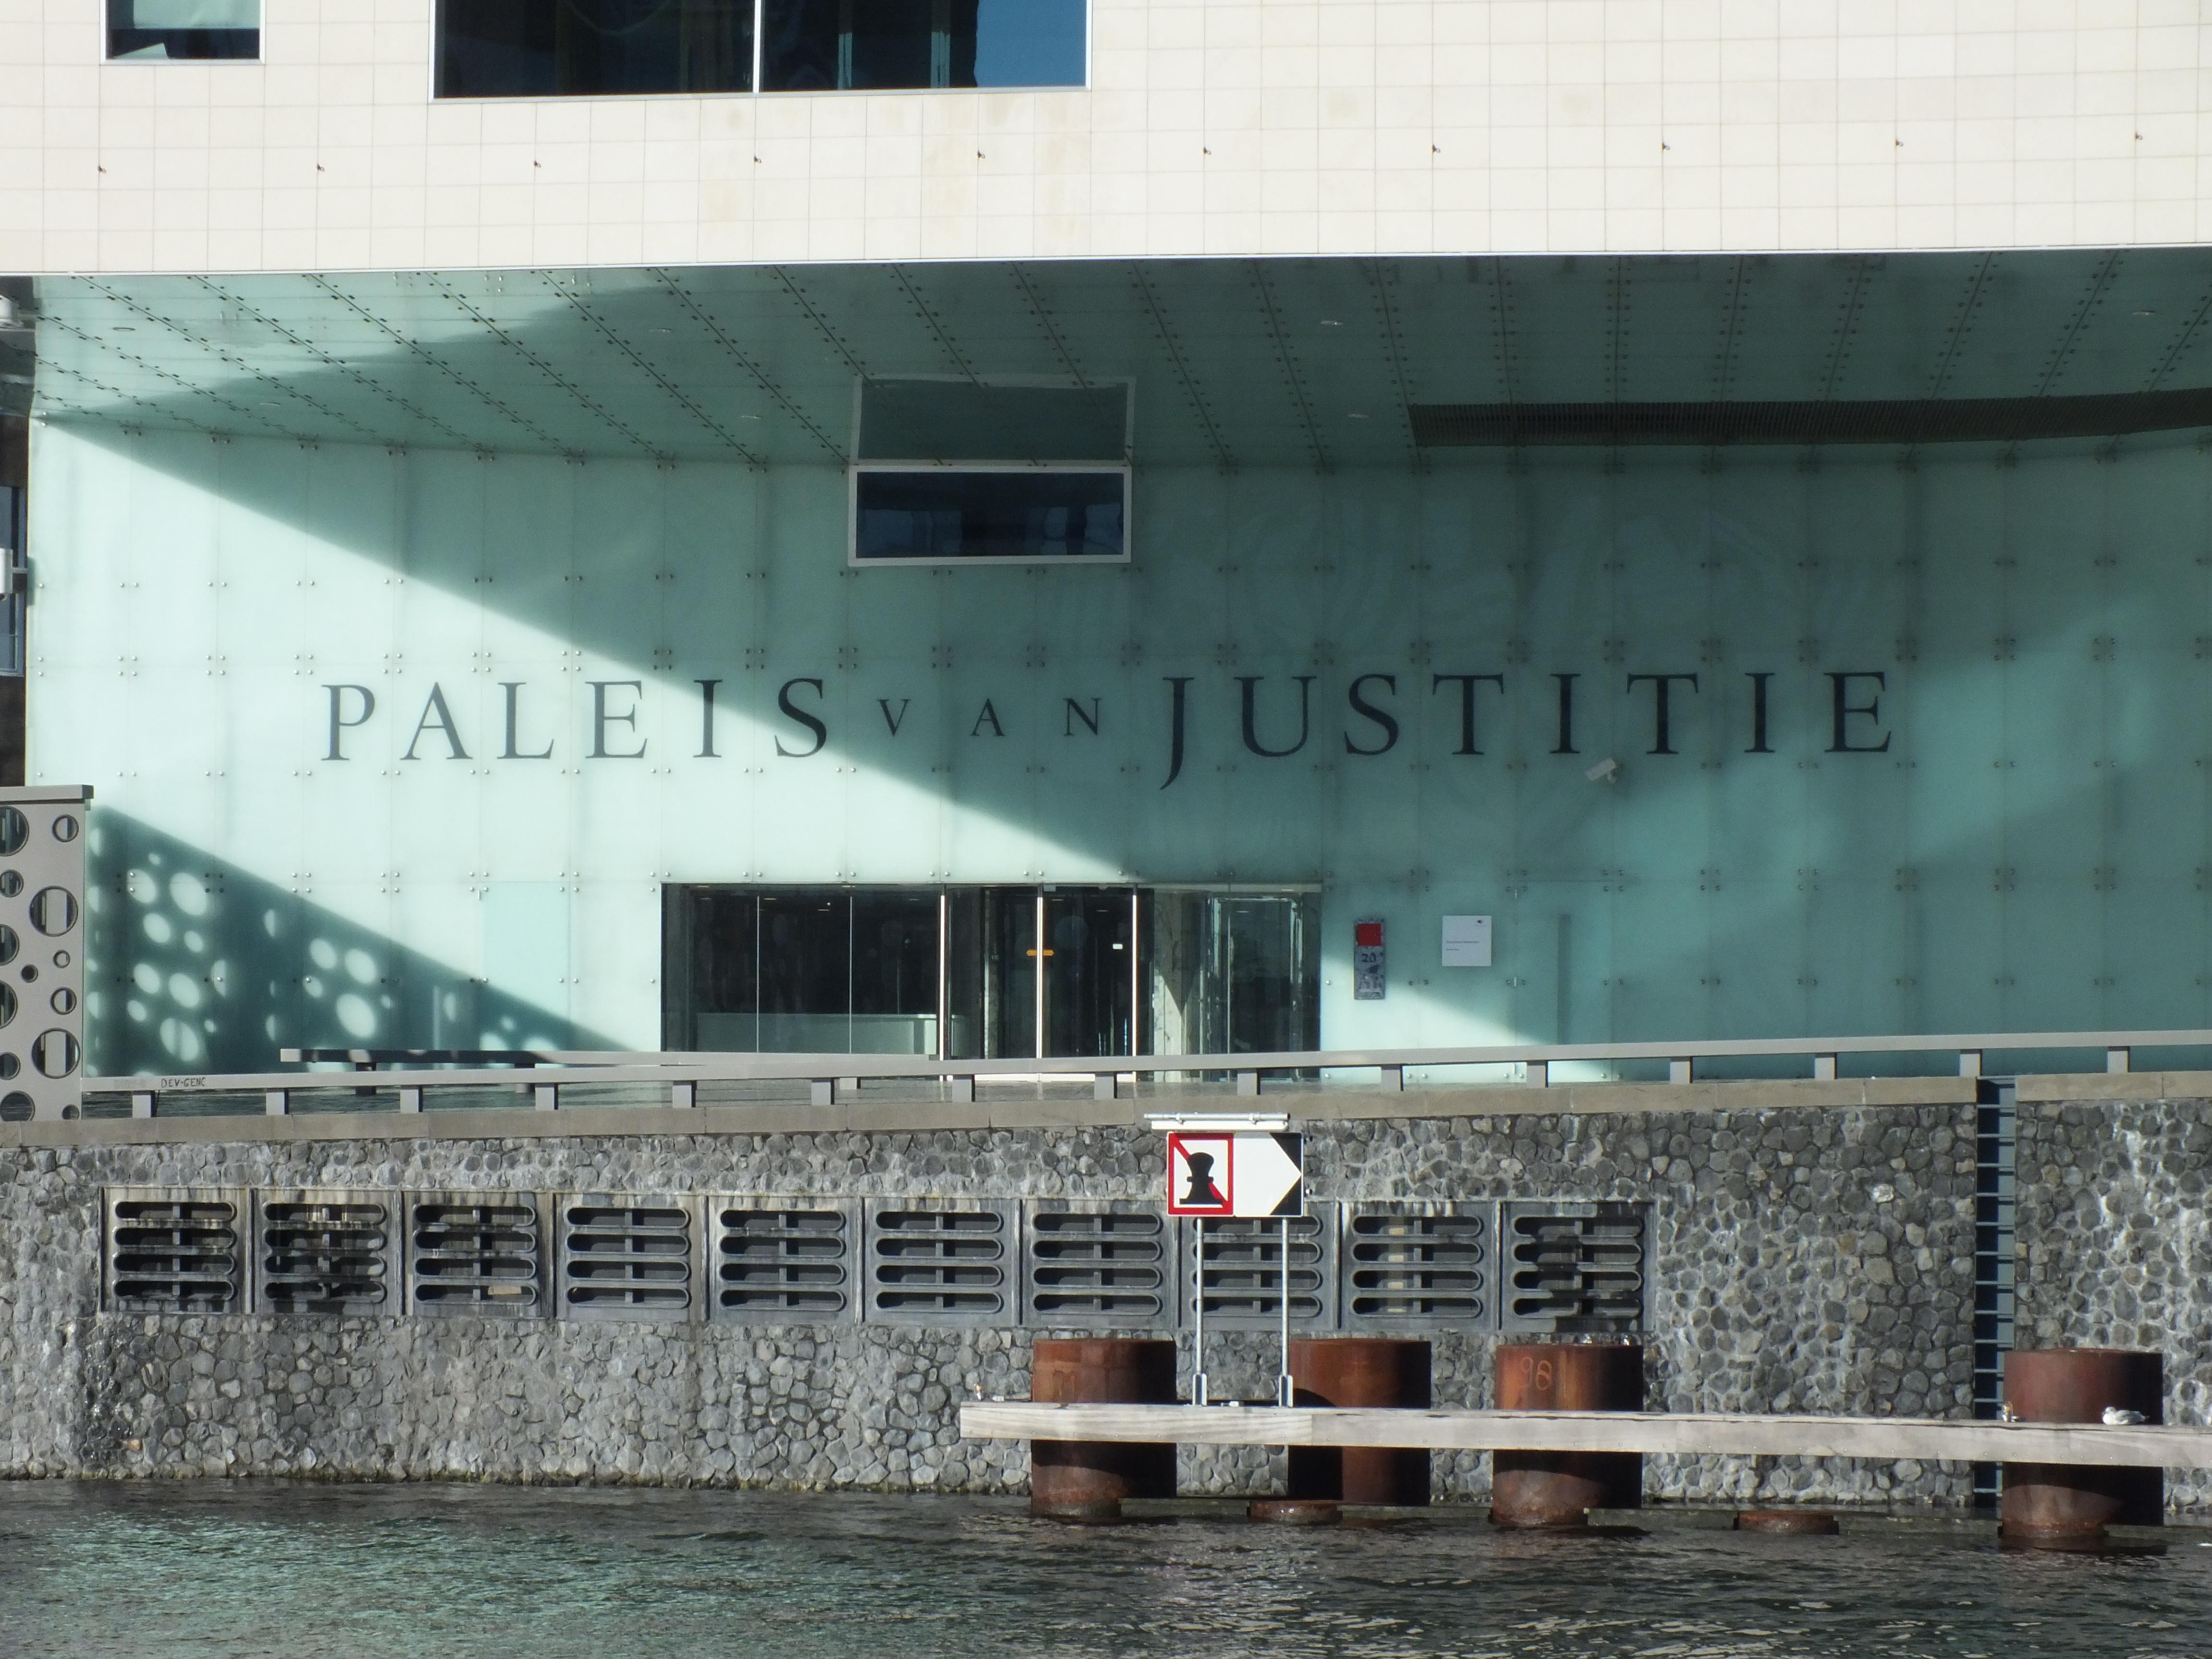 Paleis van justitie amsterdam for Melchior interieur den haag